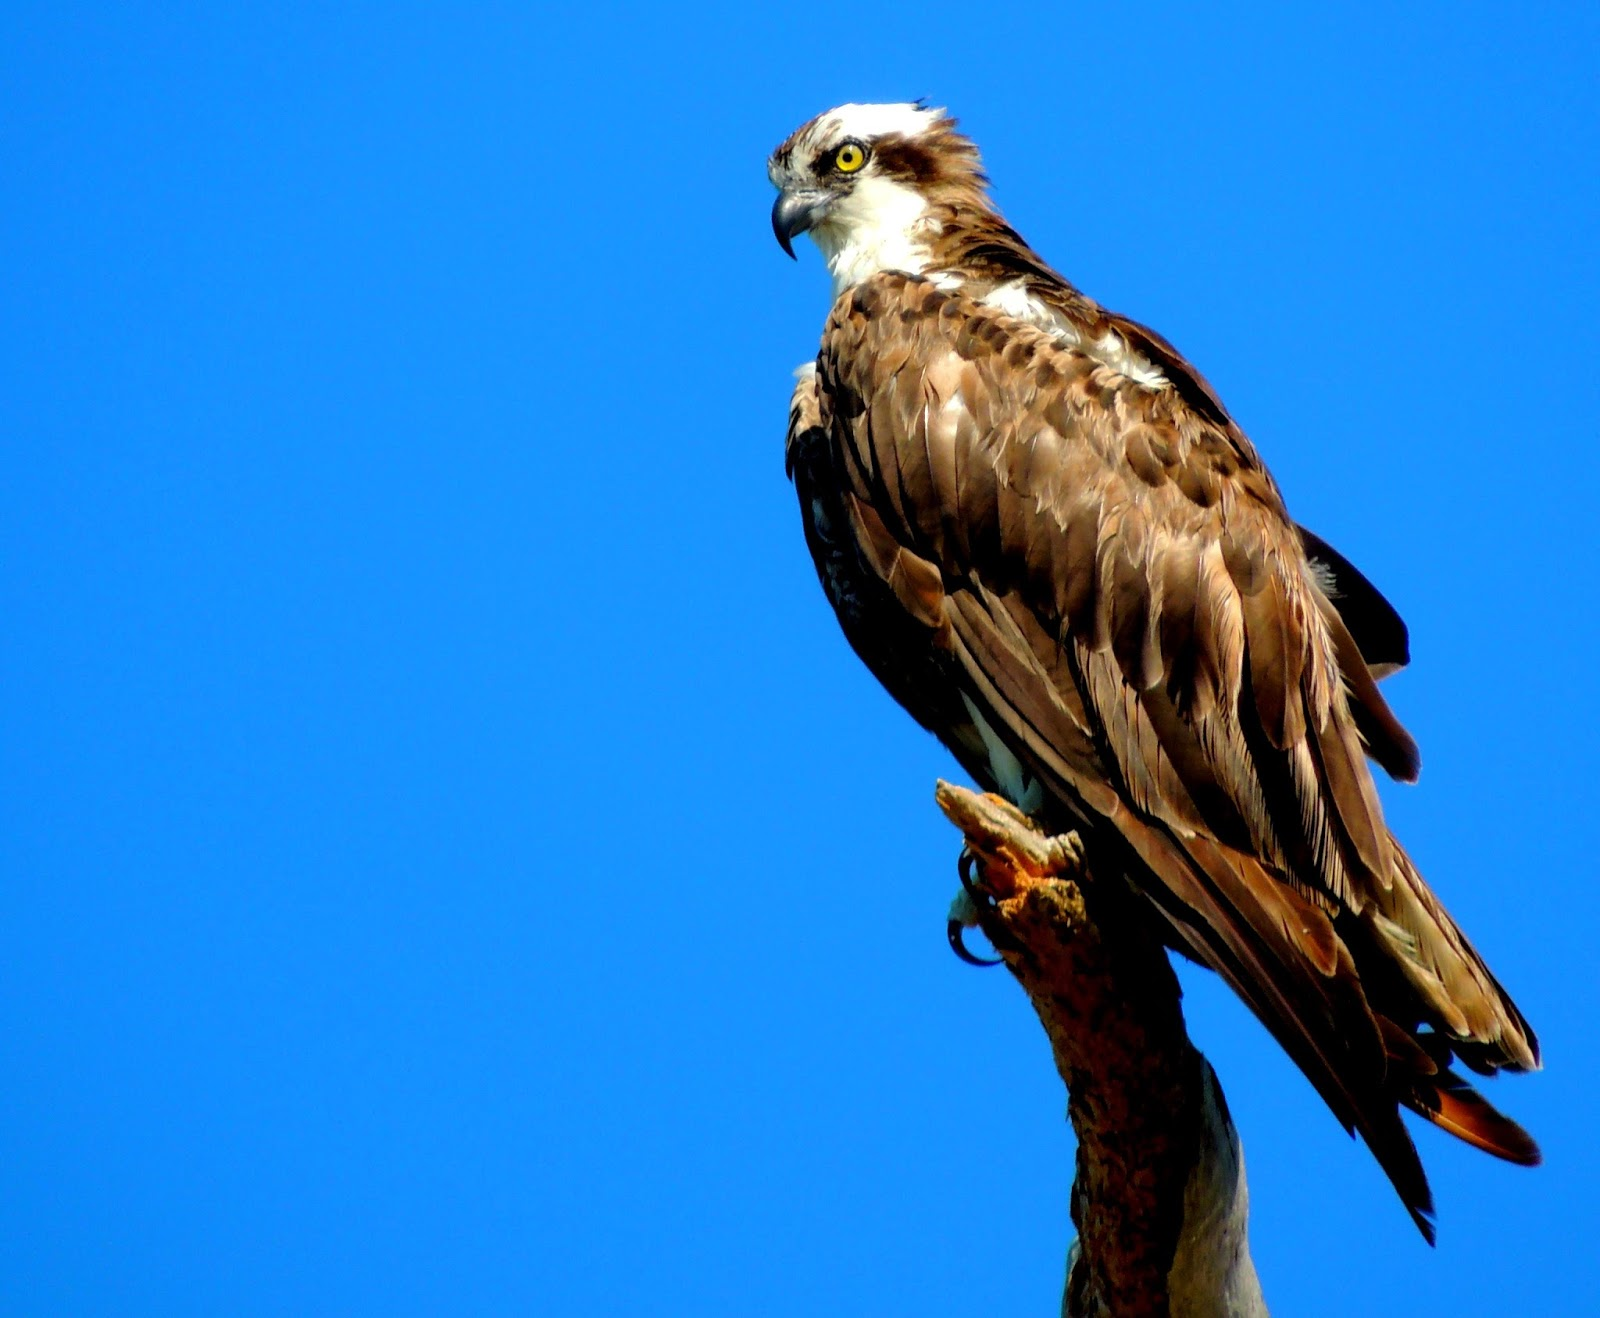 Darby-Carr-9-Osprey.-ever-vigilant.jpg